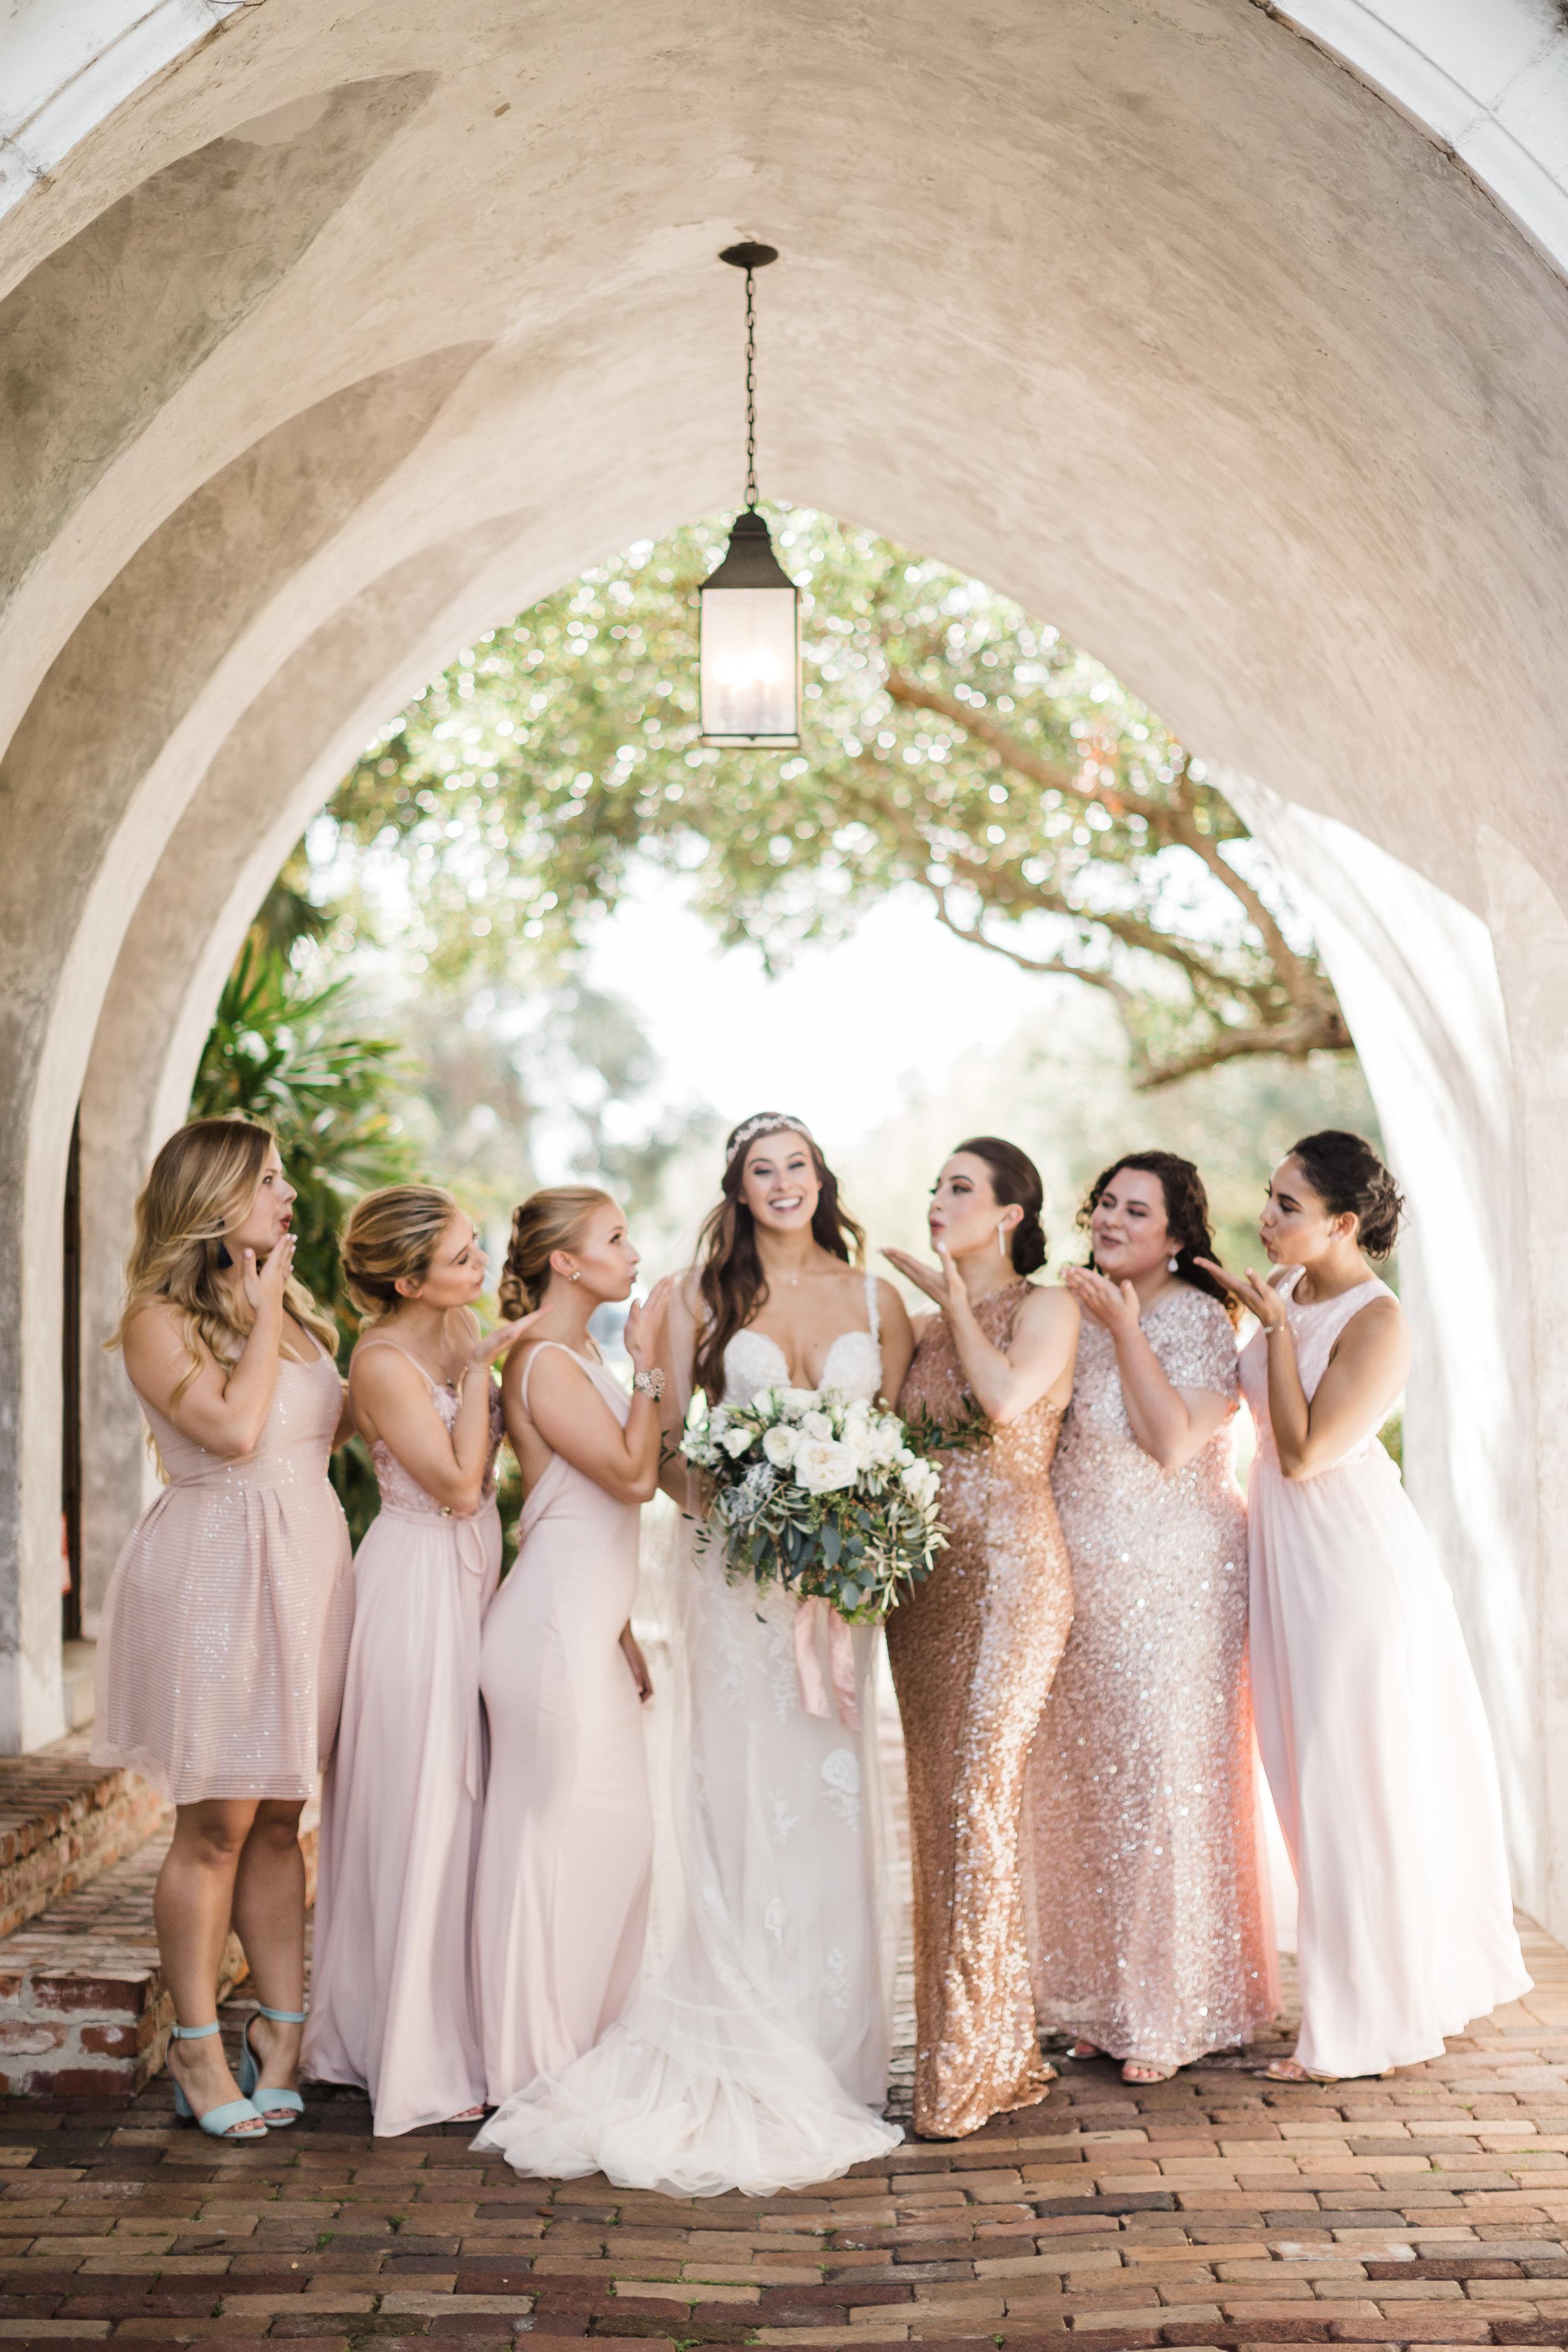 2017.10.15 Steffi and Elliott Simmonds Casa Feliz Wedding (285 of 969).jpg